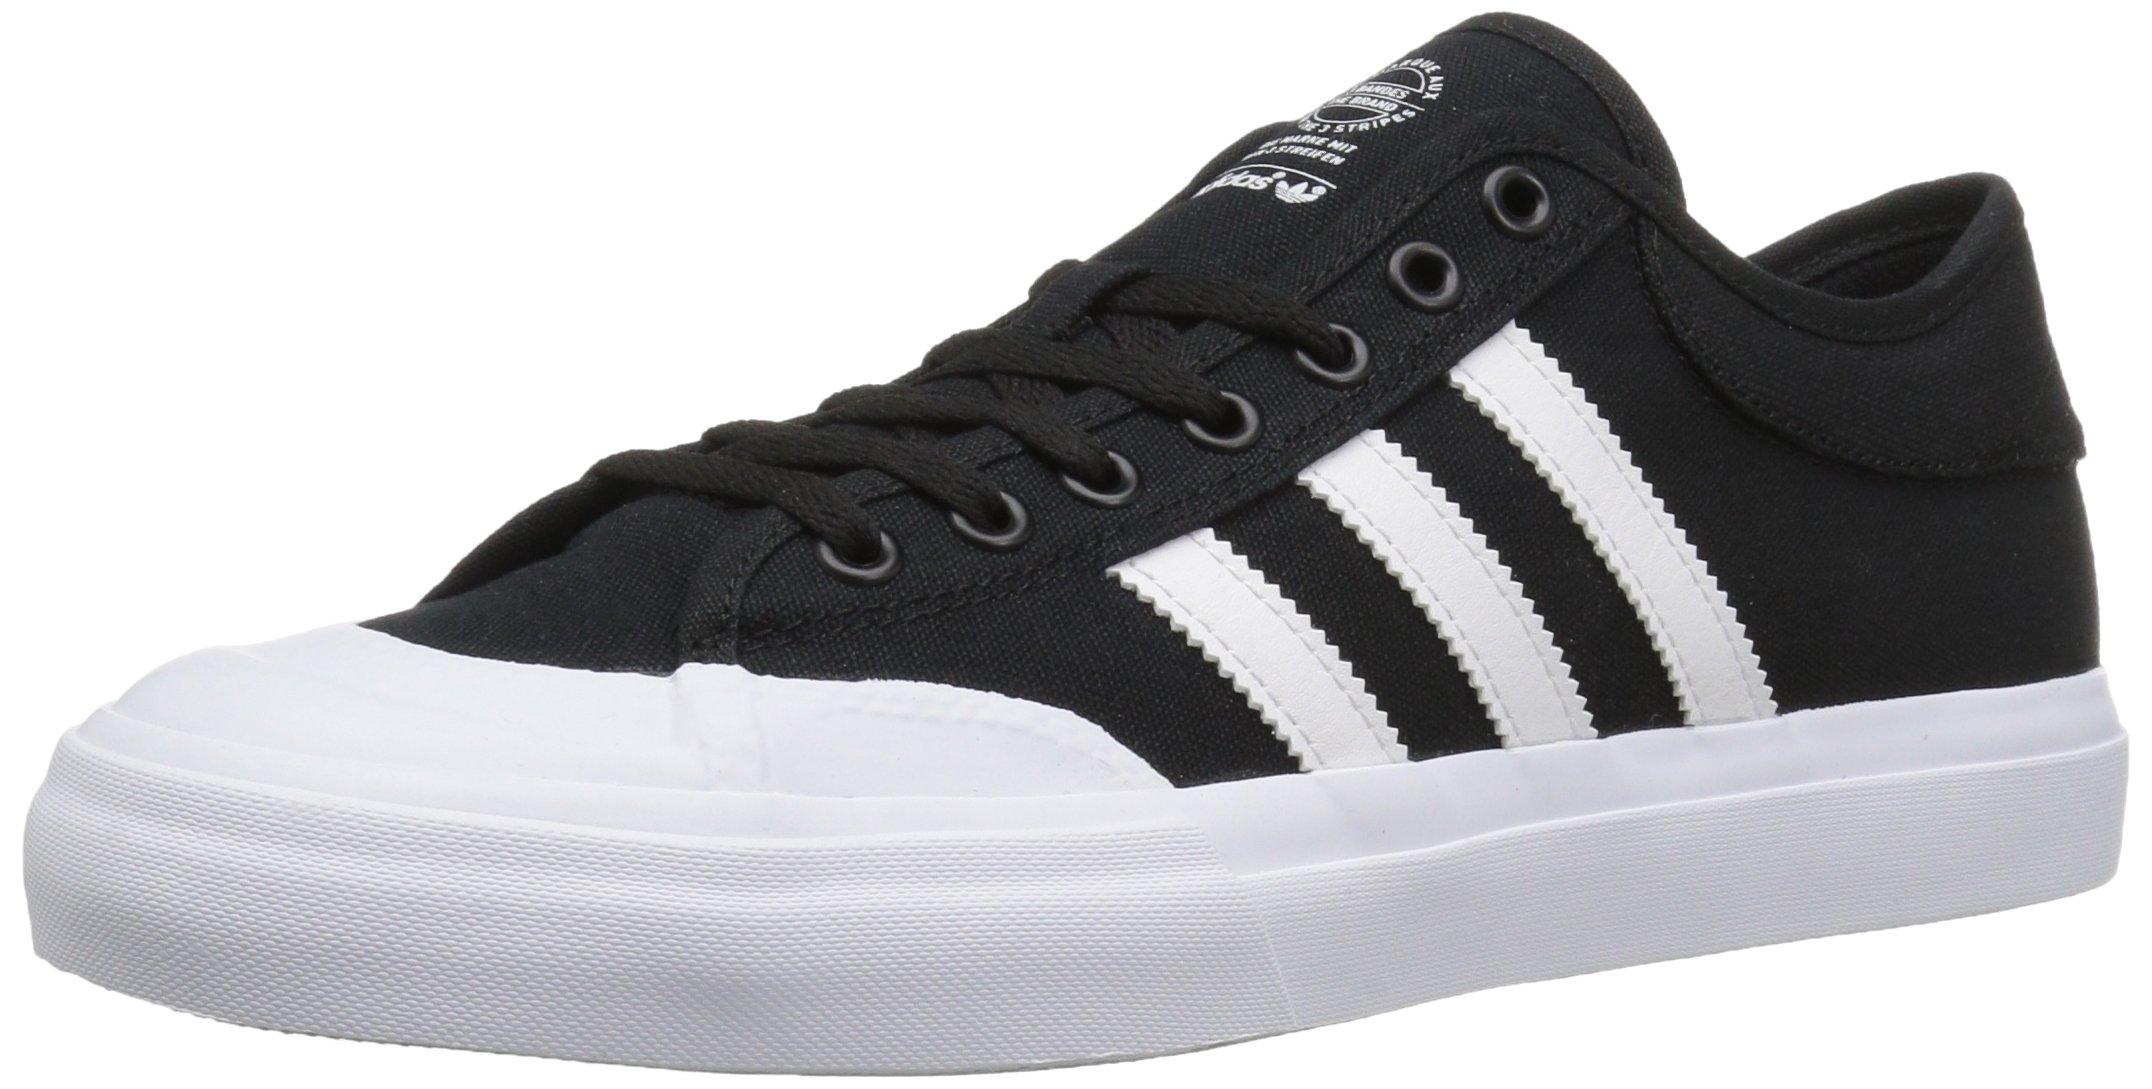 adidas Originals Men's Matchcourt Fashion Sneakers White/Black, (7 M US)